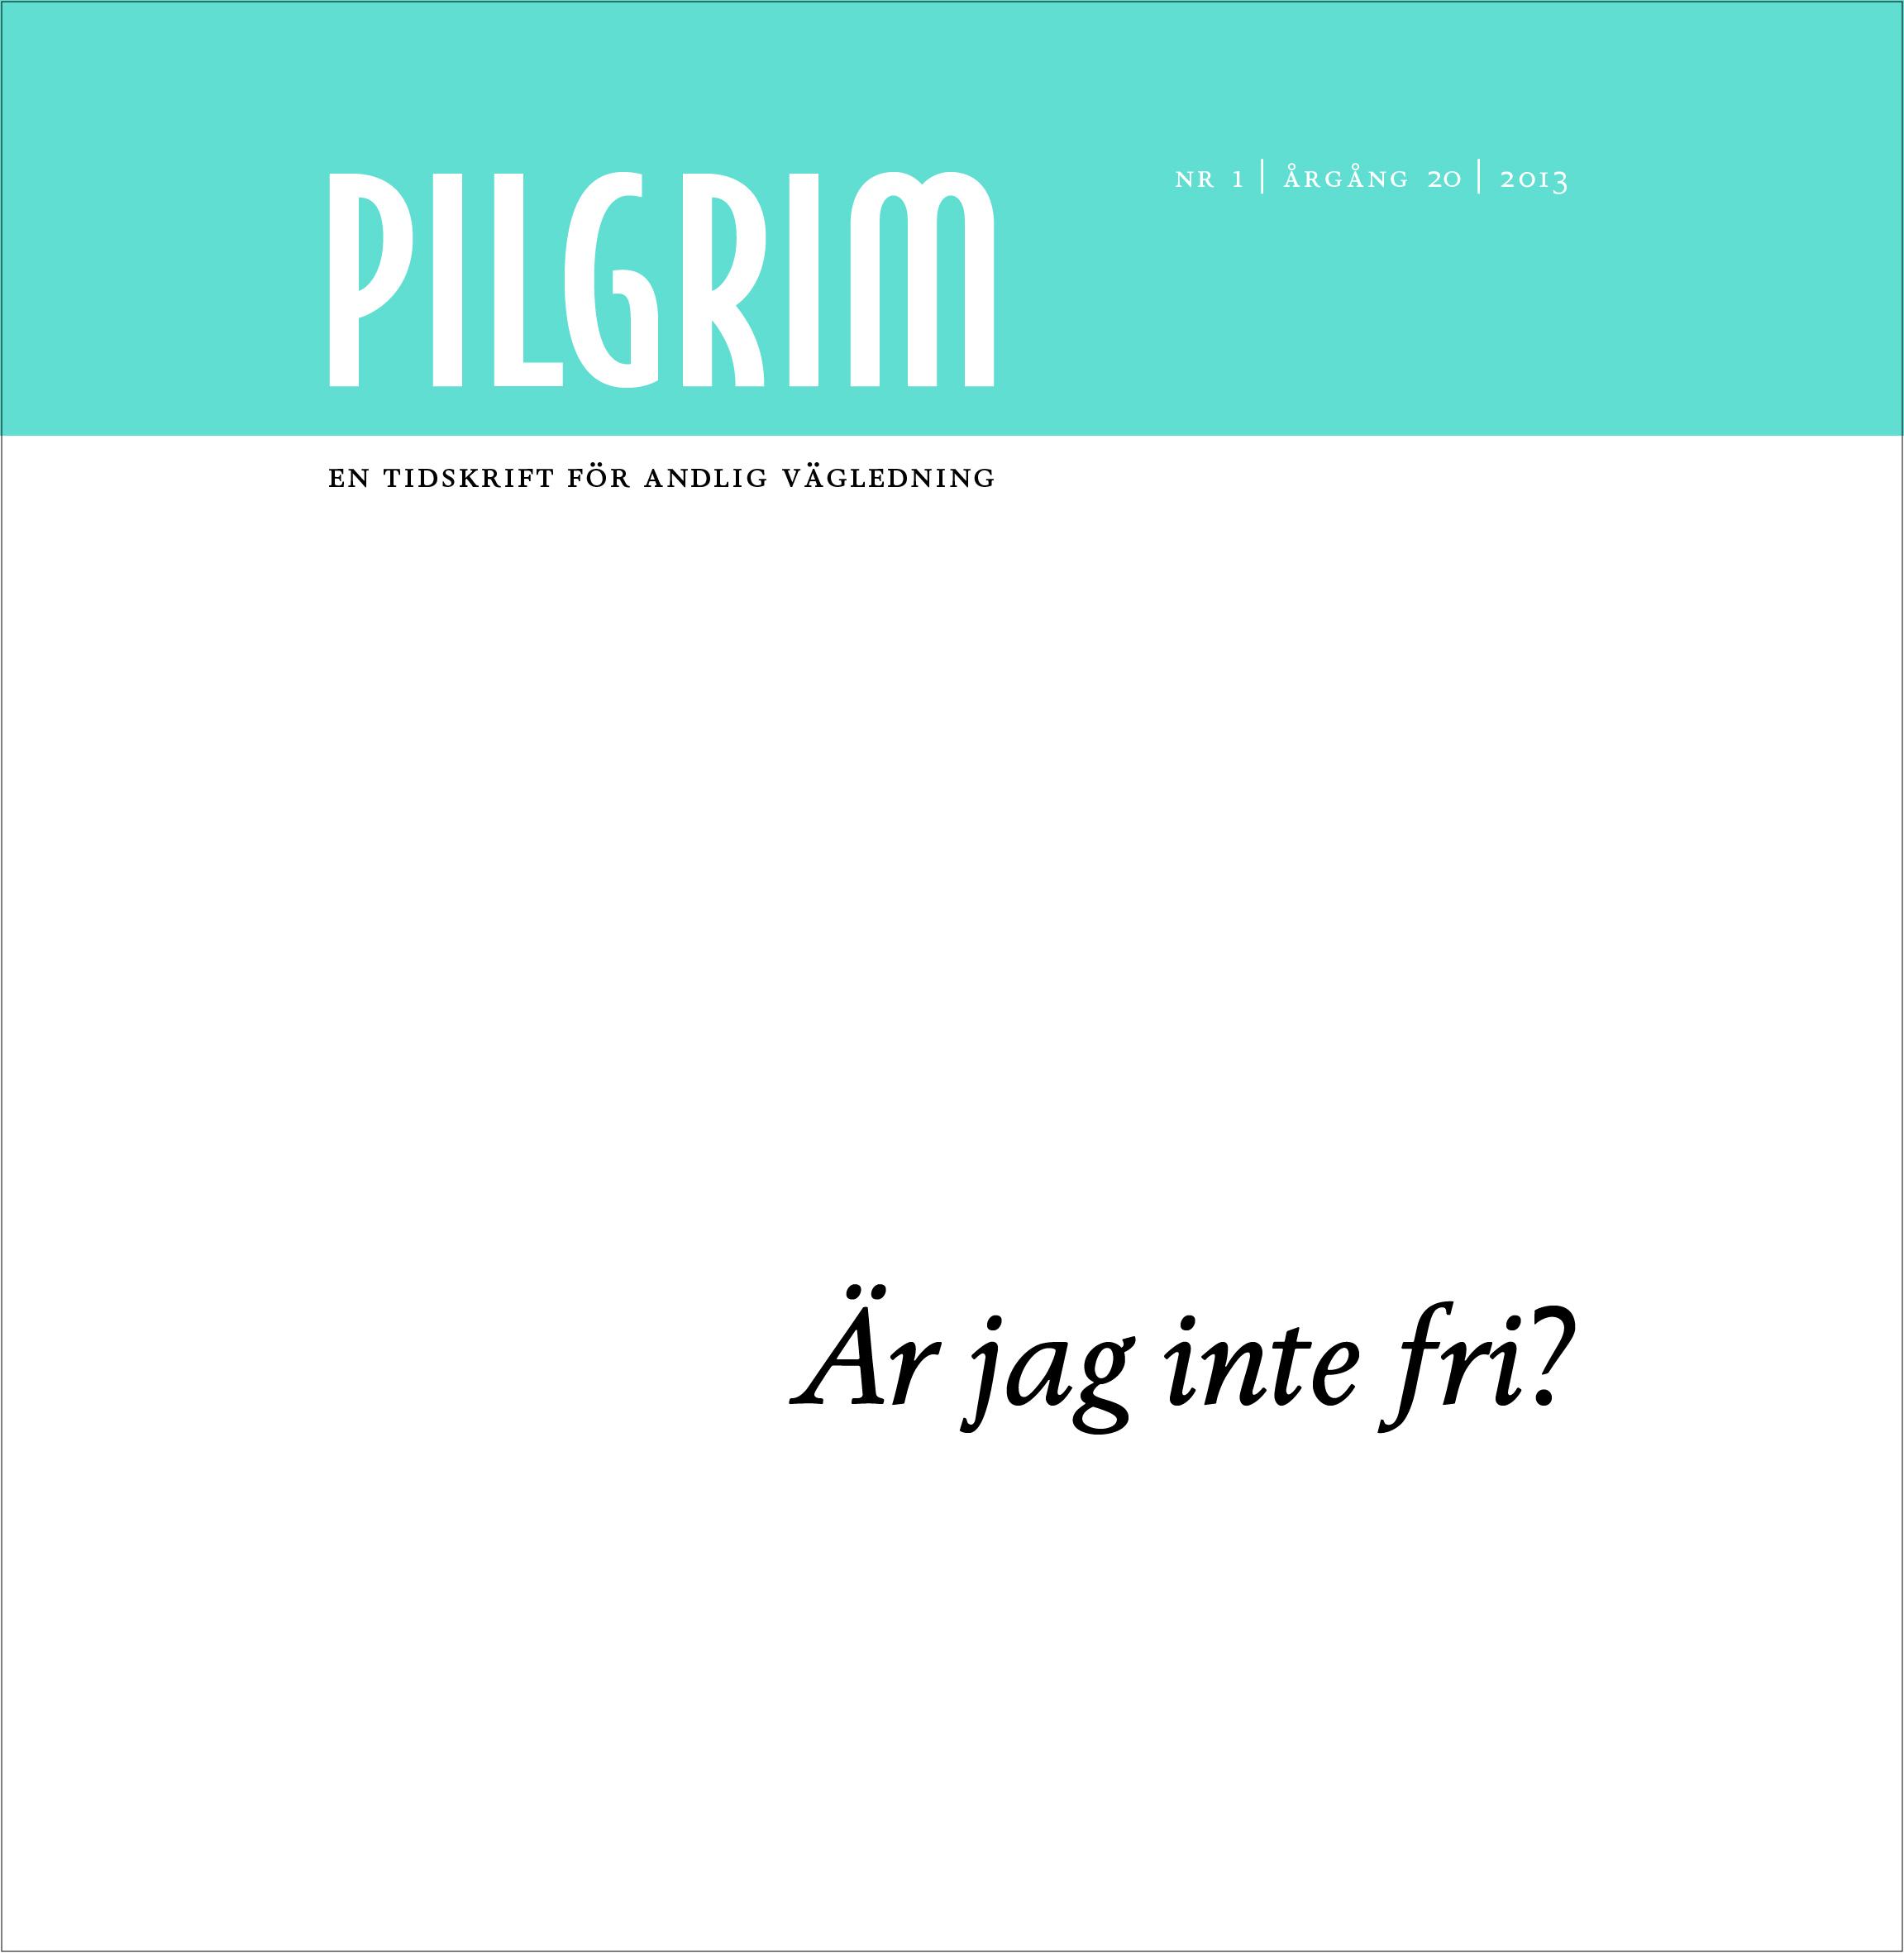 Pilgrim frams 2013-1